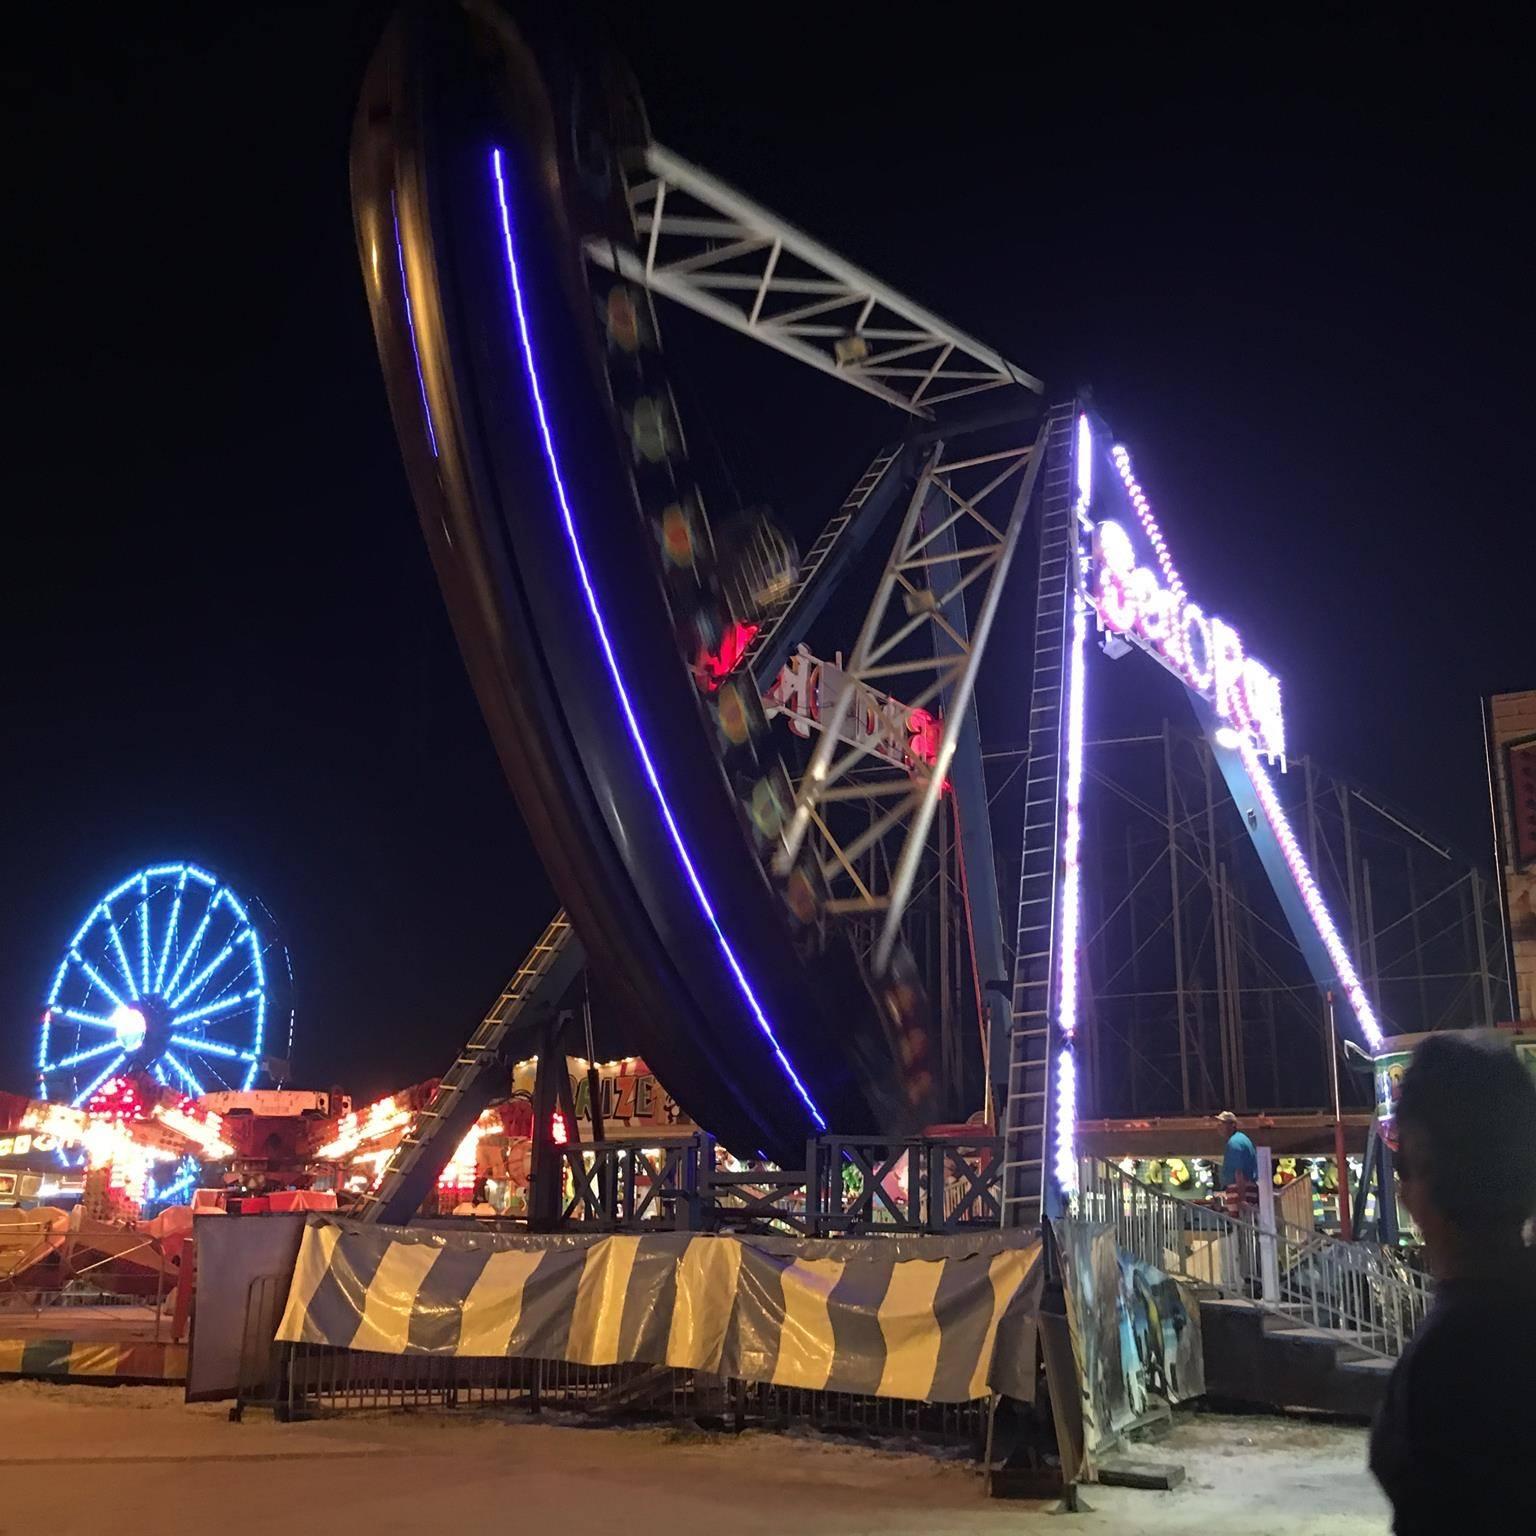 Daytona Beach Boardwalk Amusement Rides - Travel ...